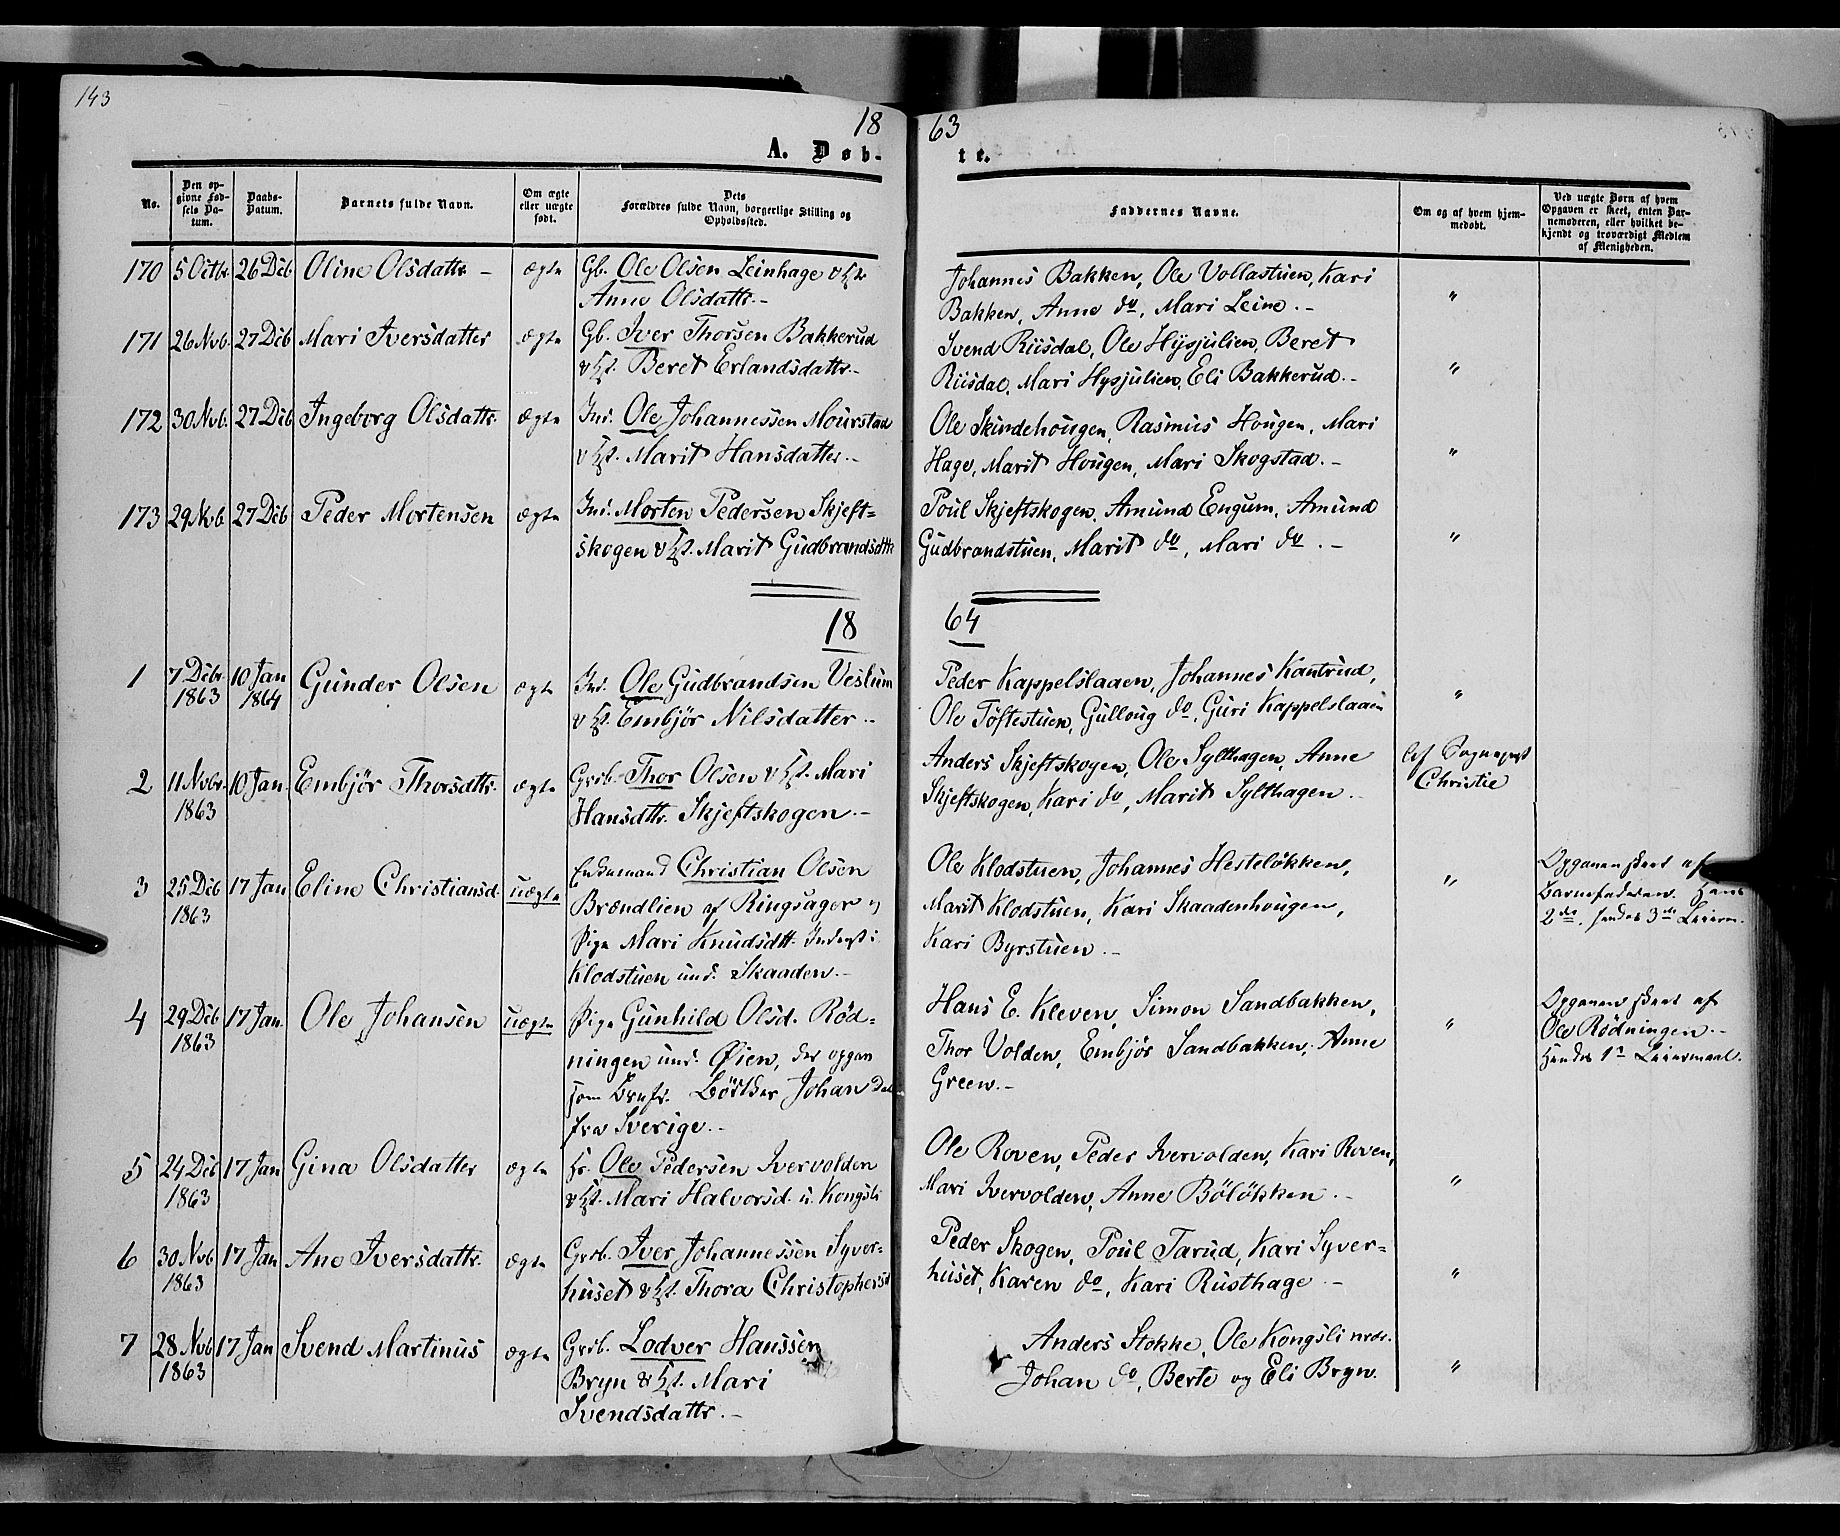 SAH, Nord-Fron prestekontor, Ministerialbok nr. 1, 1851-1864, s. 143